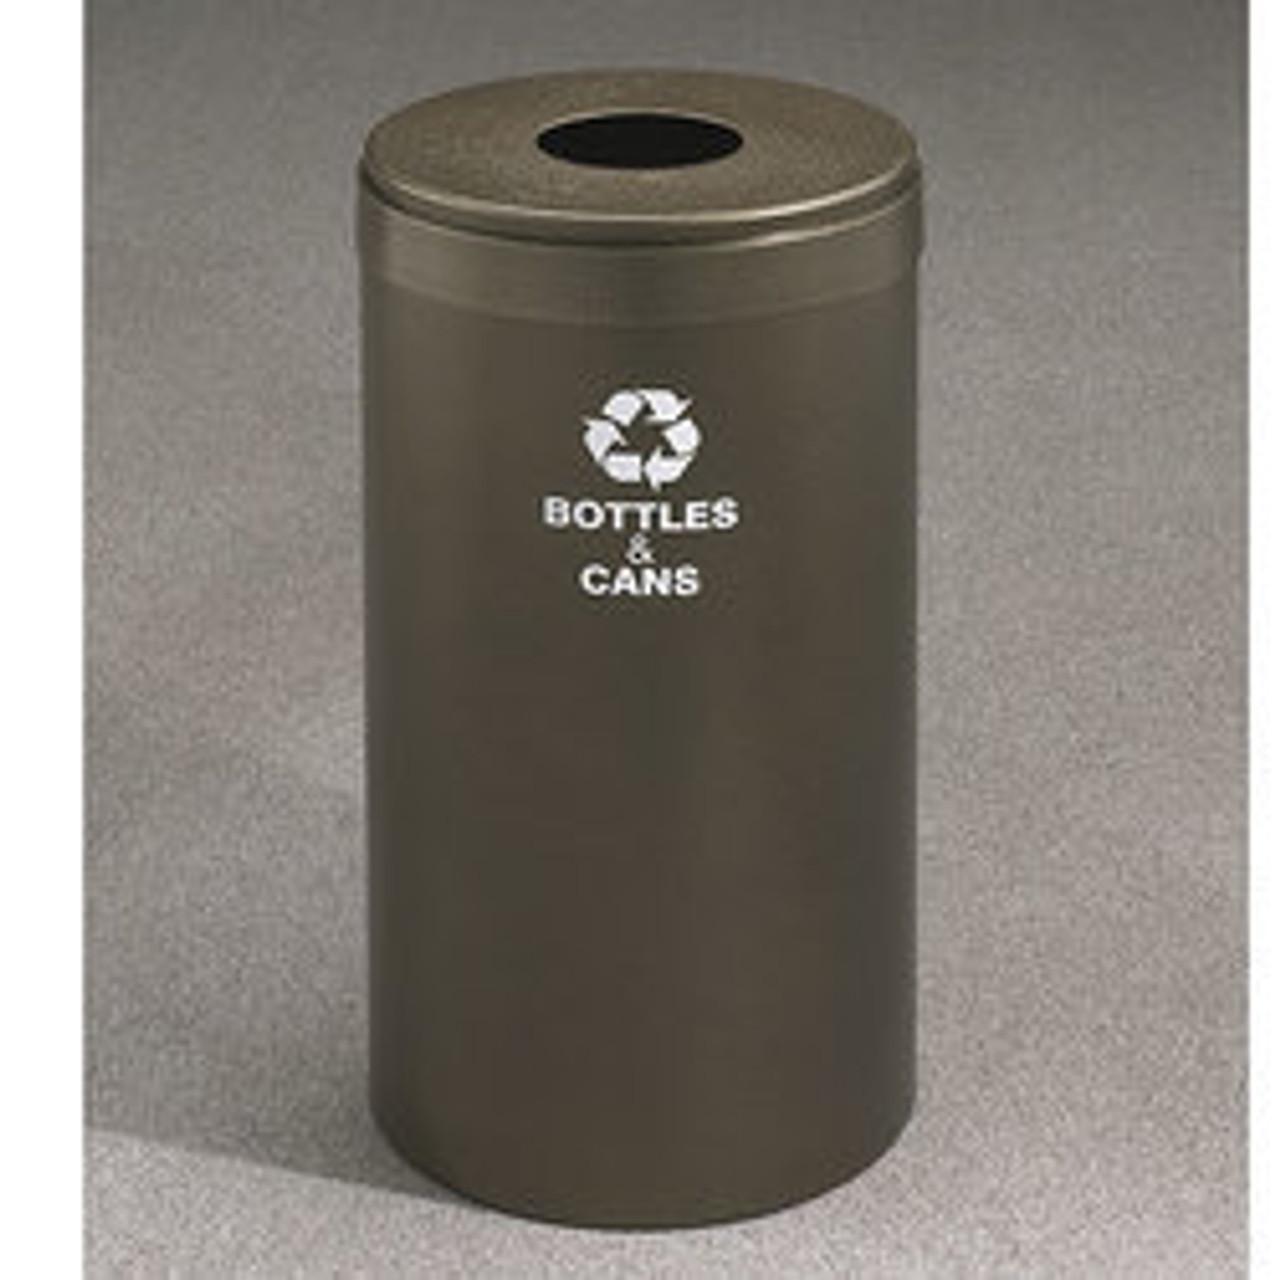 Glaro RecyclePro Value Recycling Bins